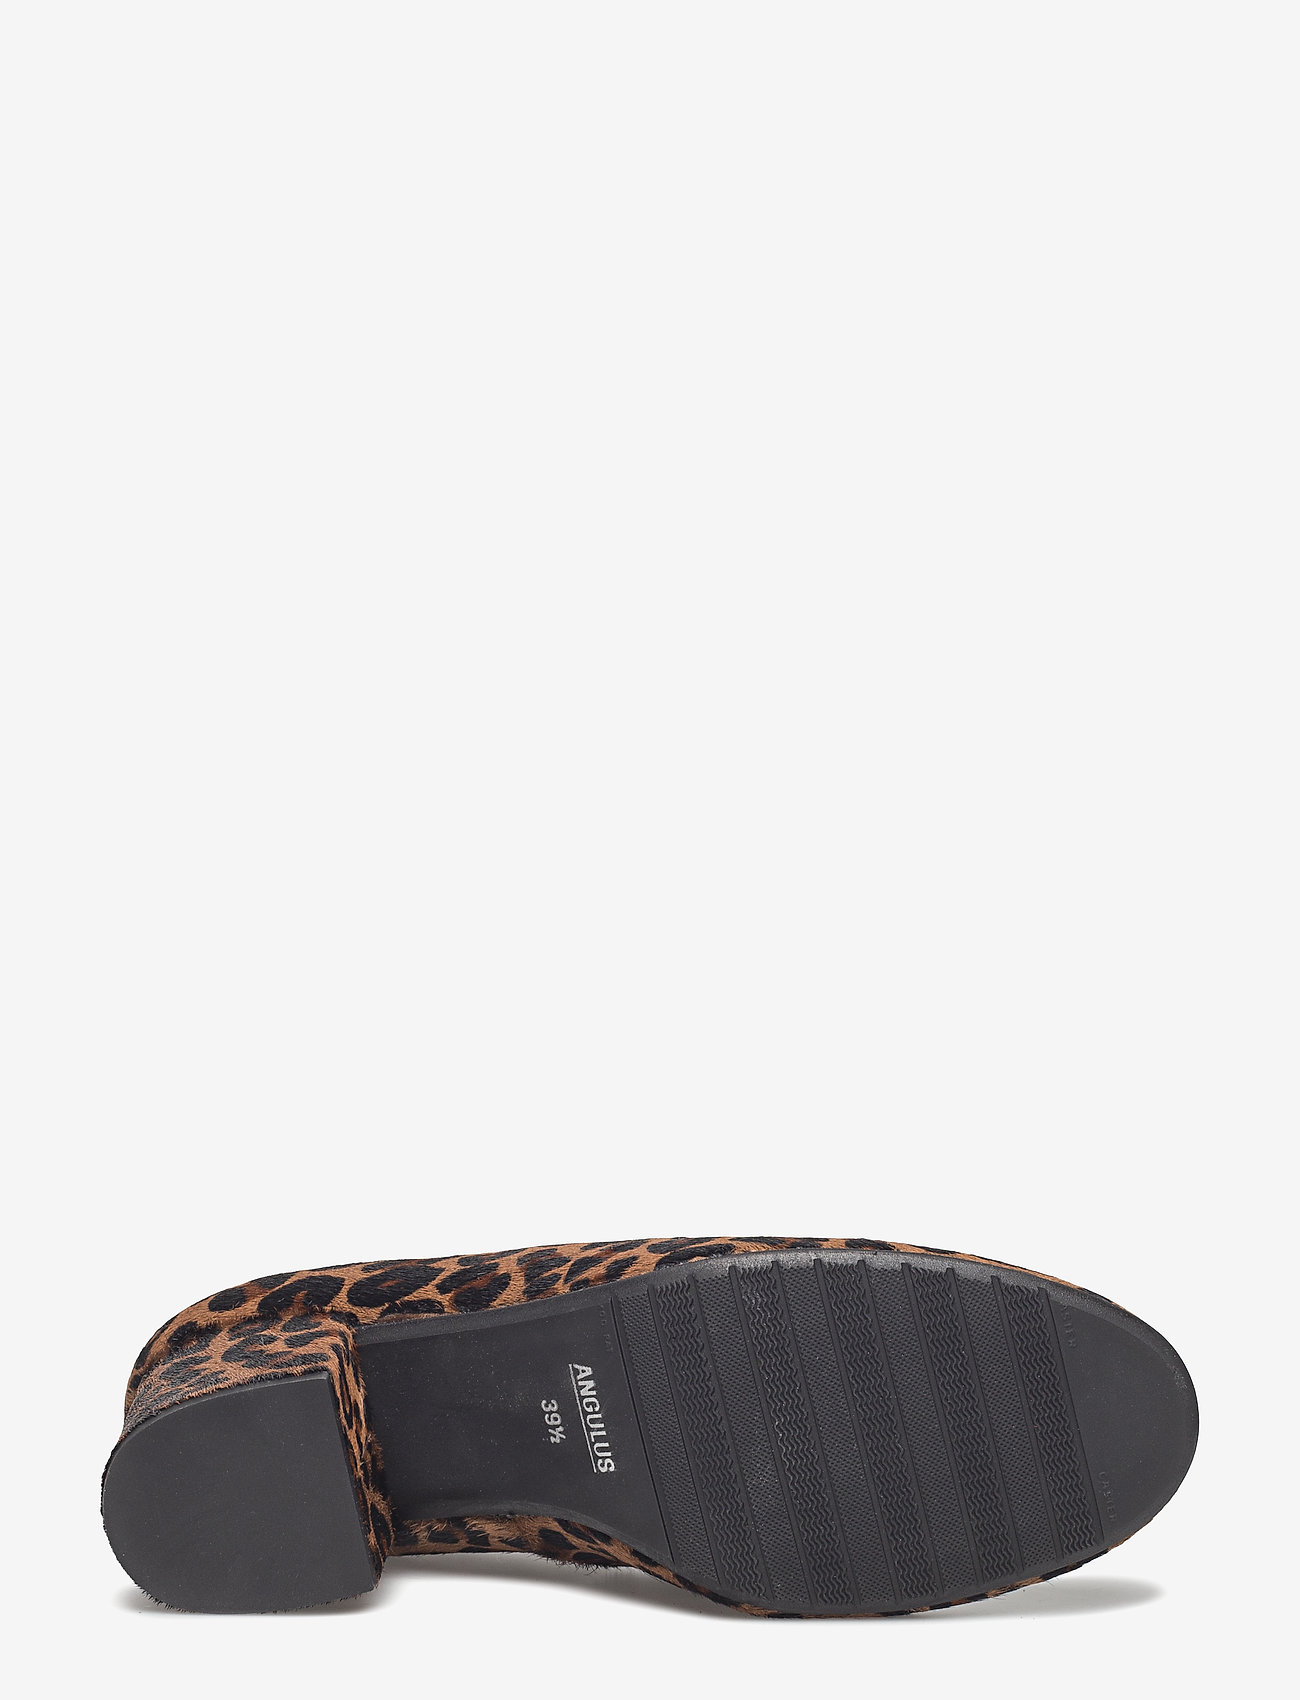 ***pump*** (1110/1163 Leopard/black) - ANGULUS